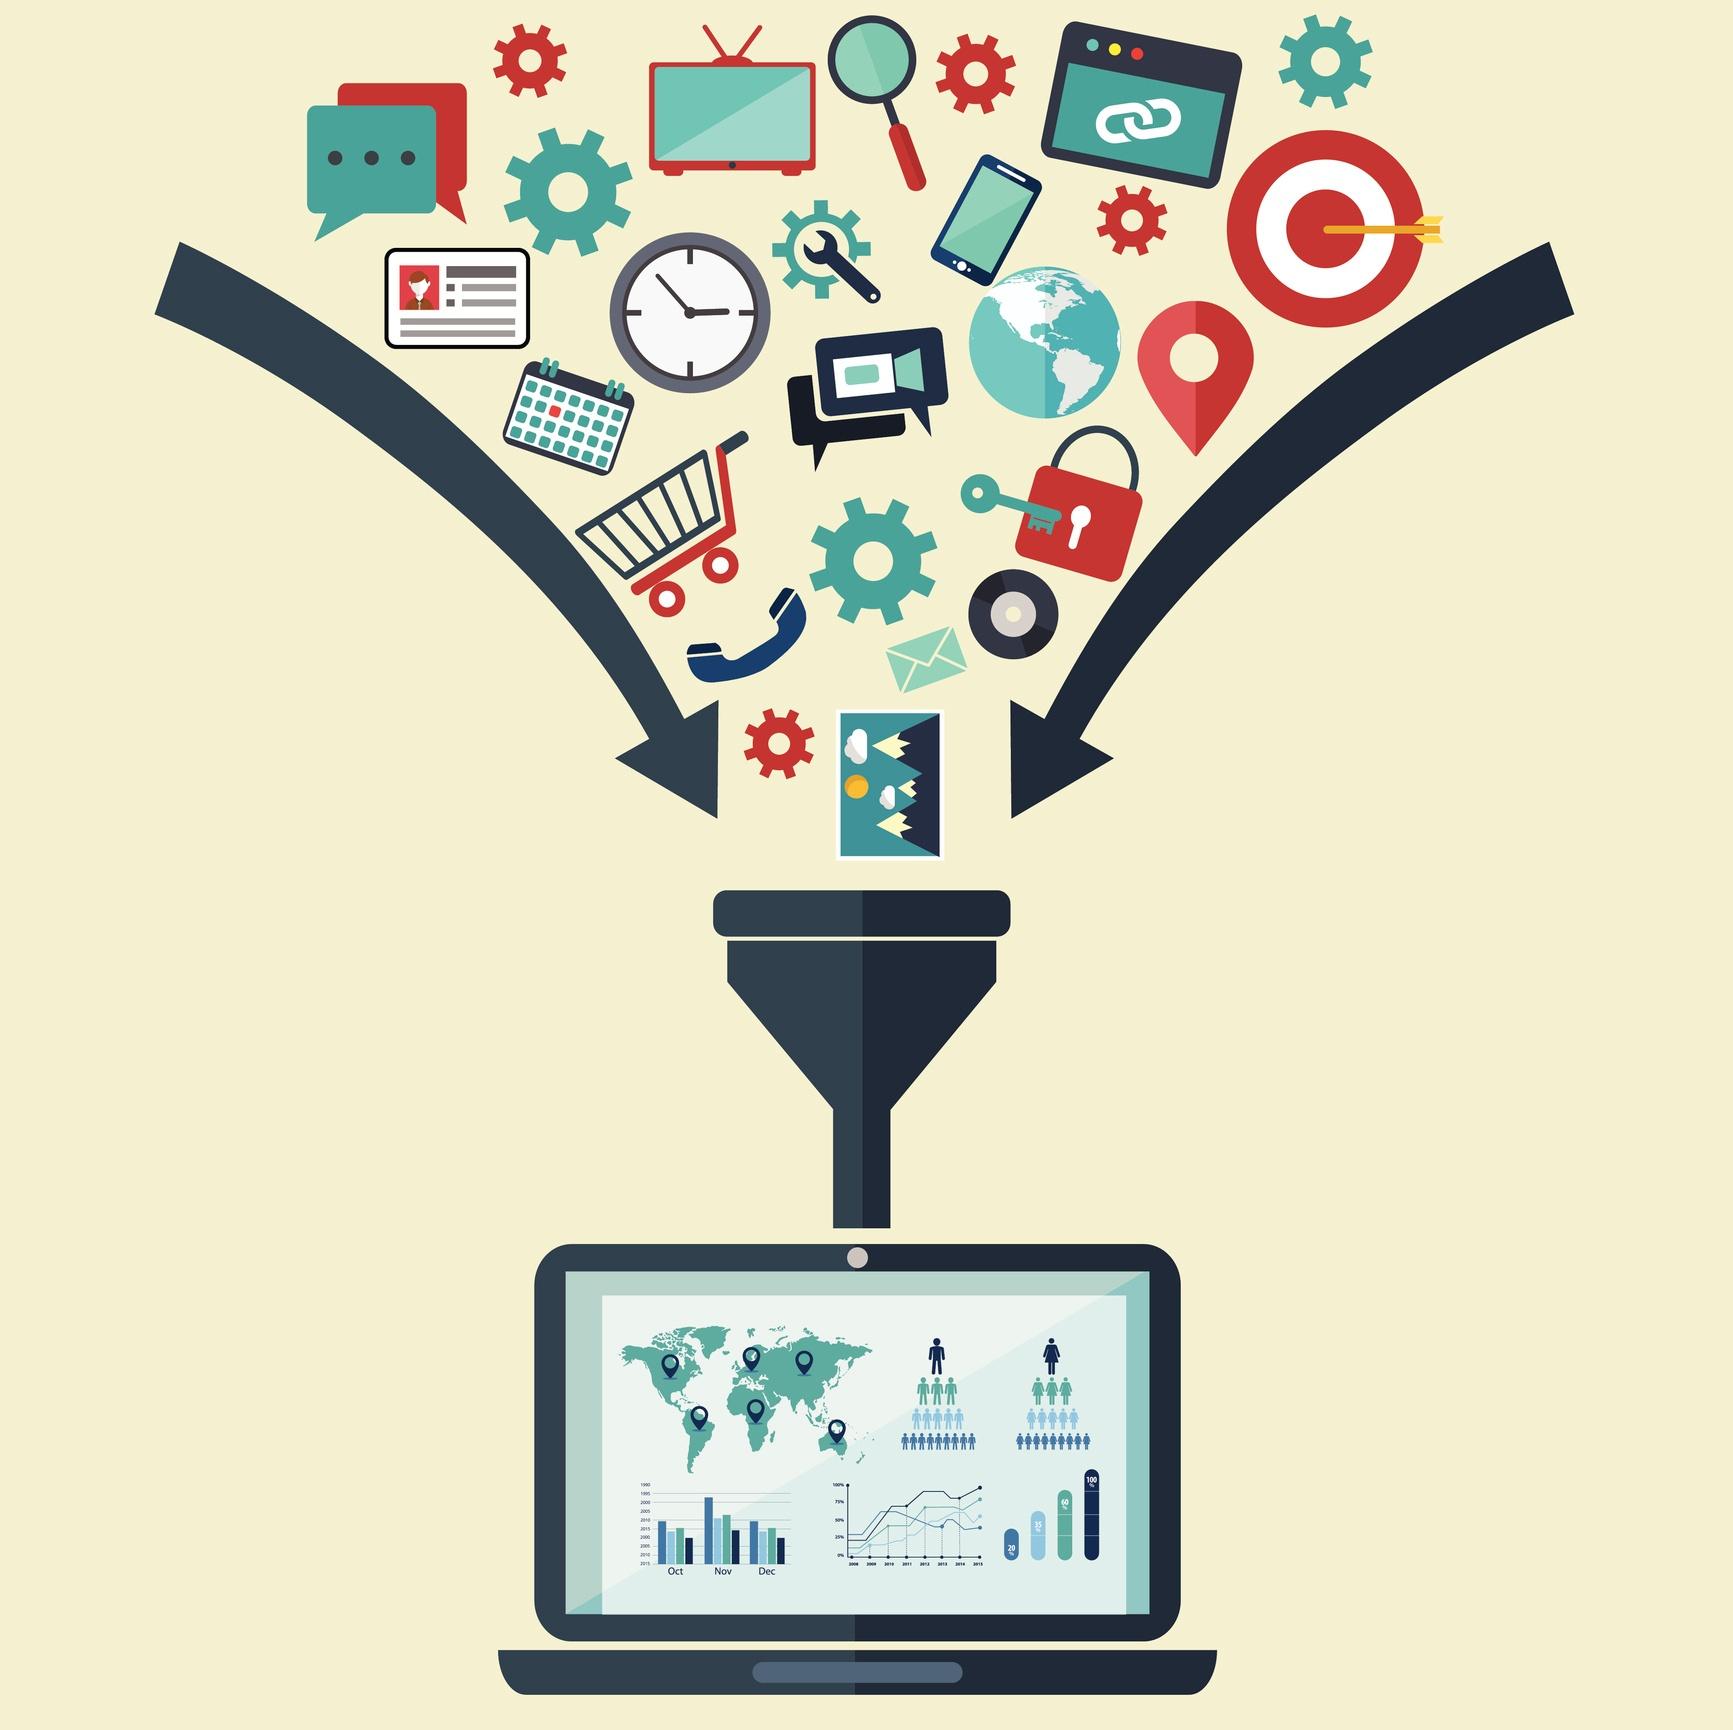 Demolish Data Silos to Improve Contact Center Performance